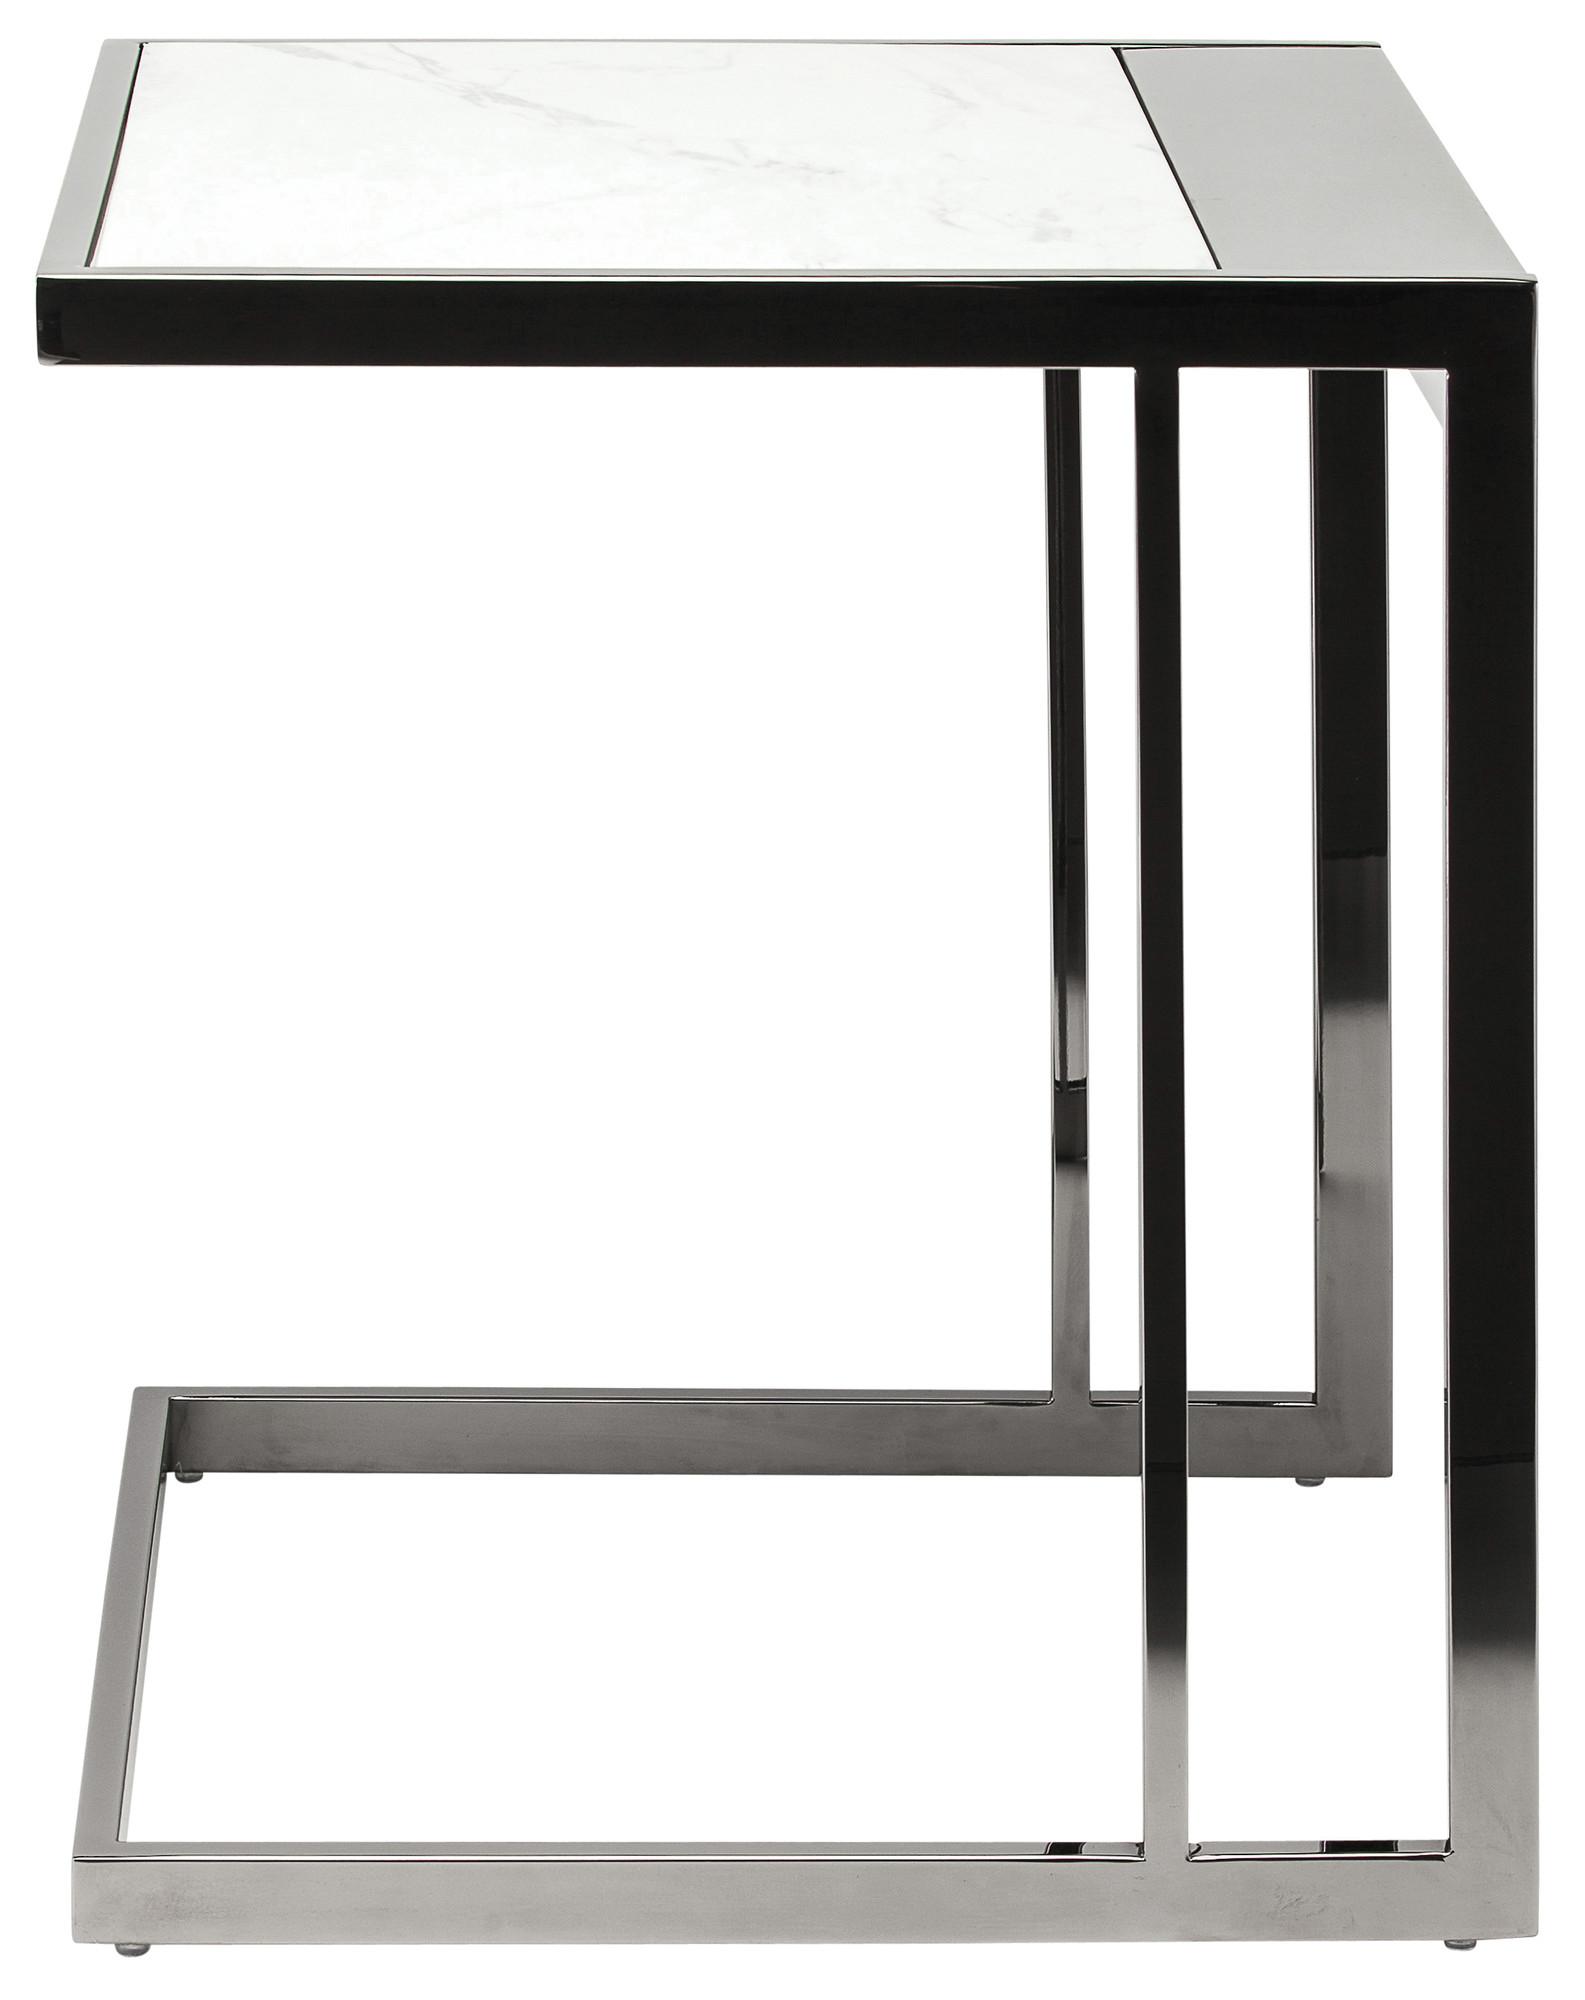 ethan-nuevo-black-side-table-marble.jpg